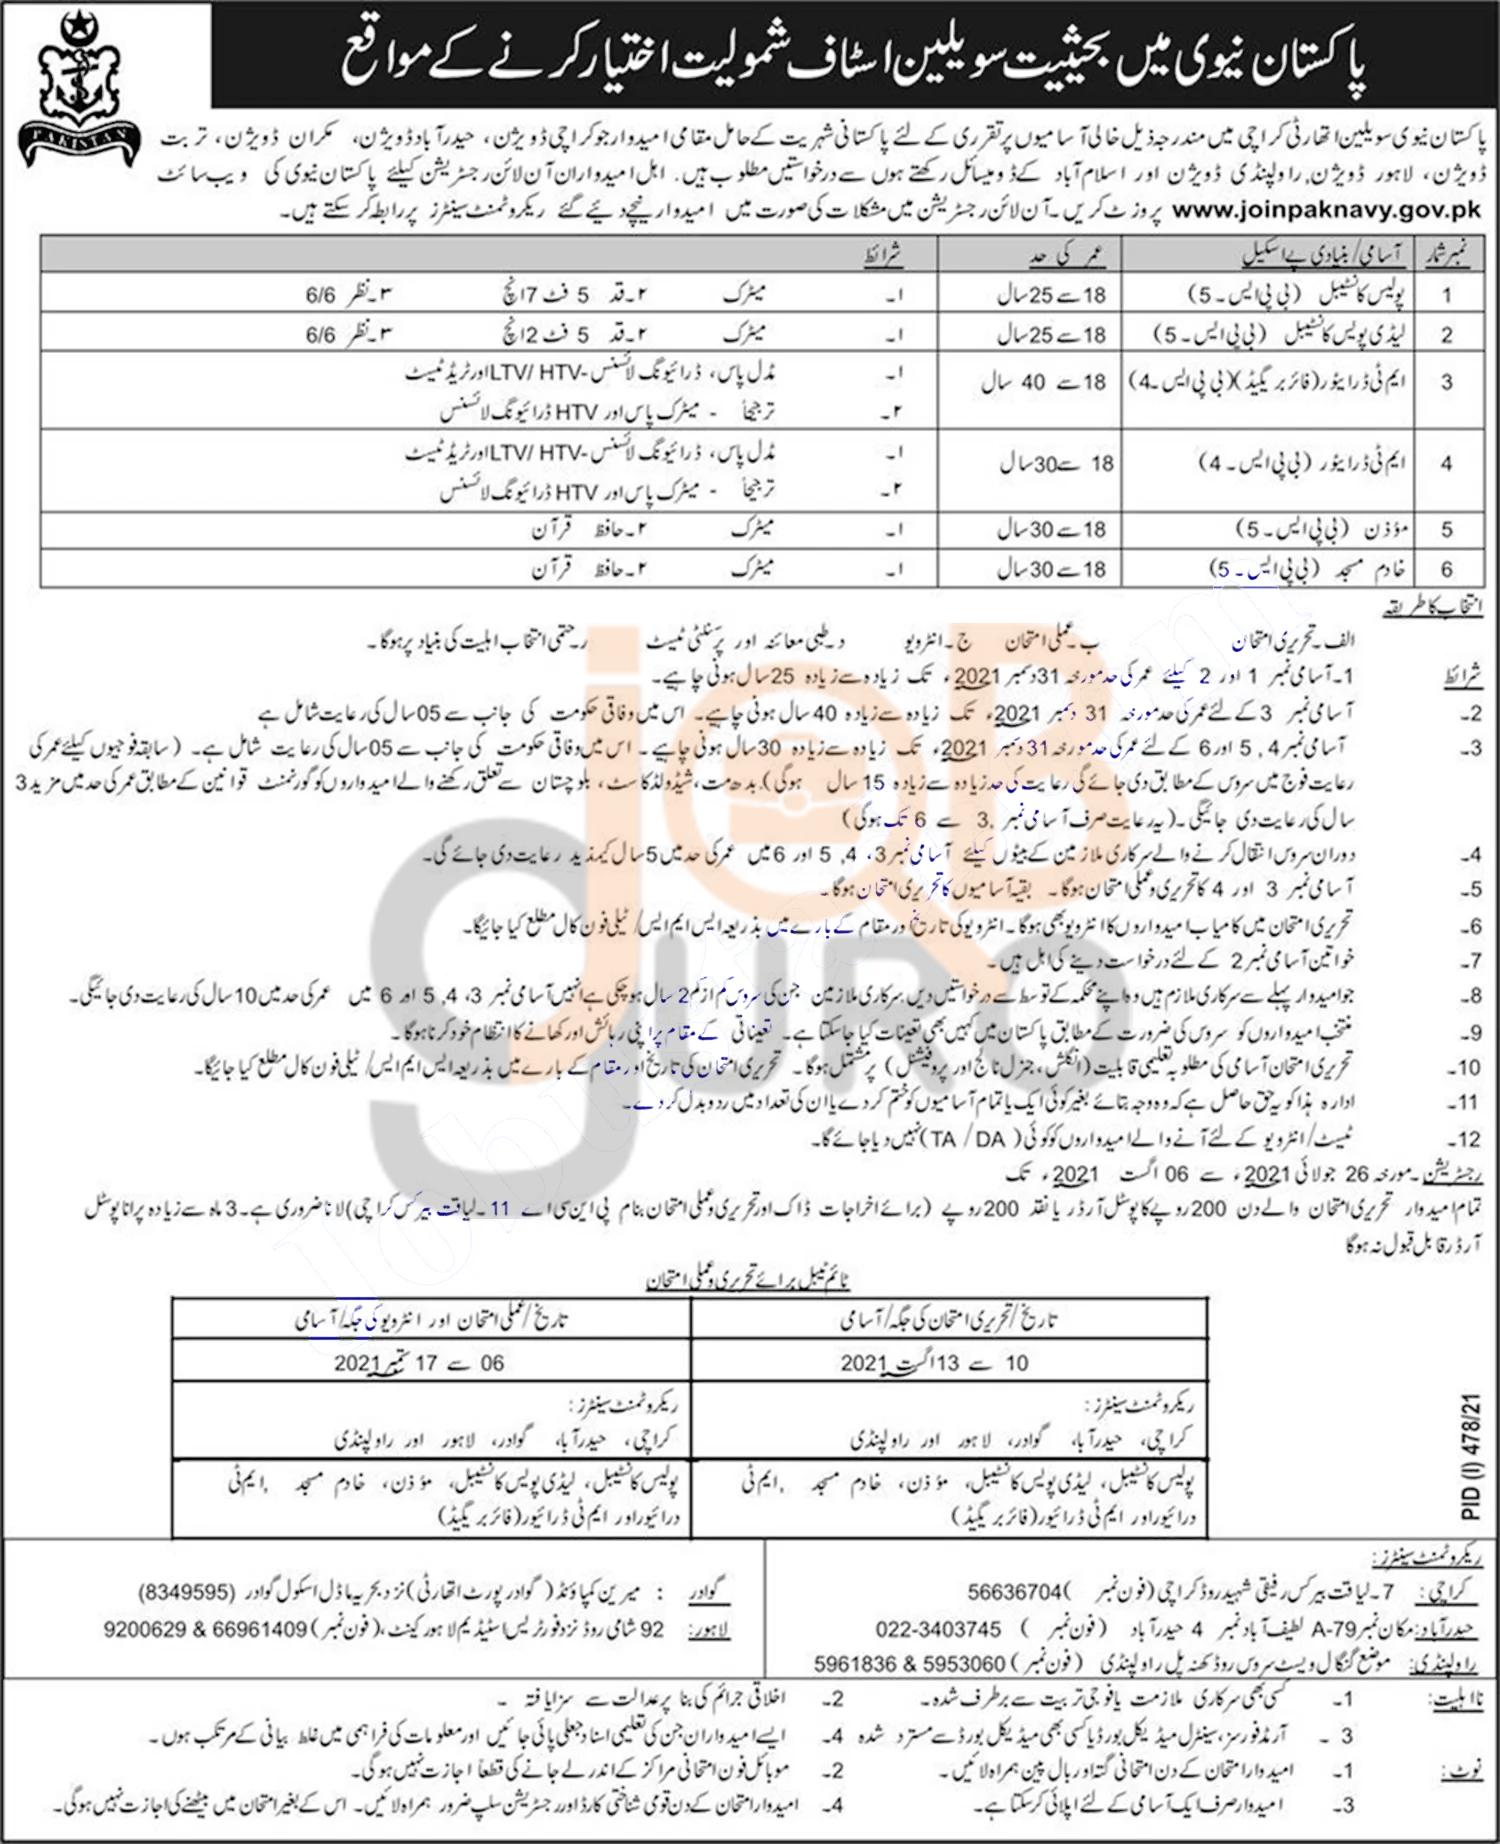 pak-navy-civilian-jobs-2021-advertisement